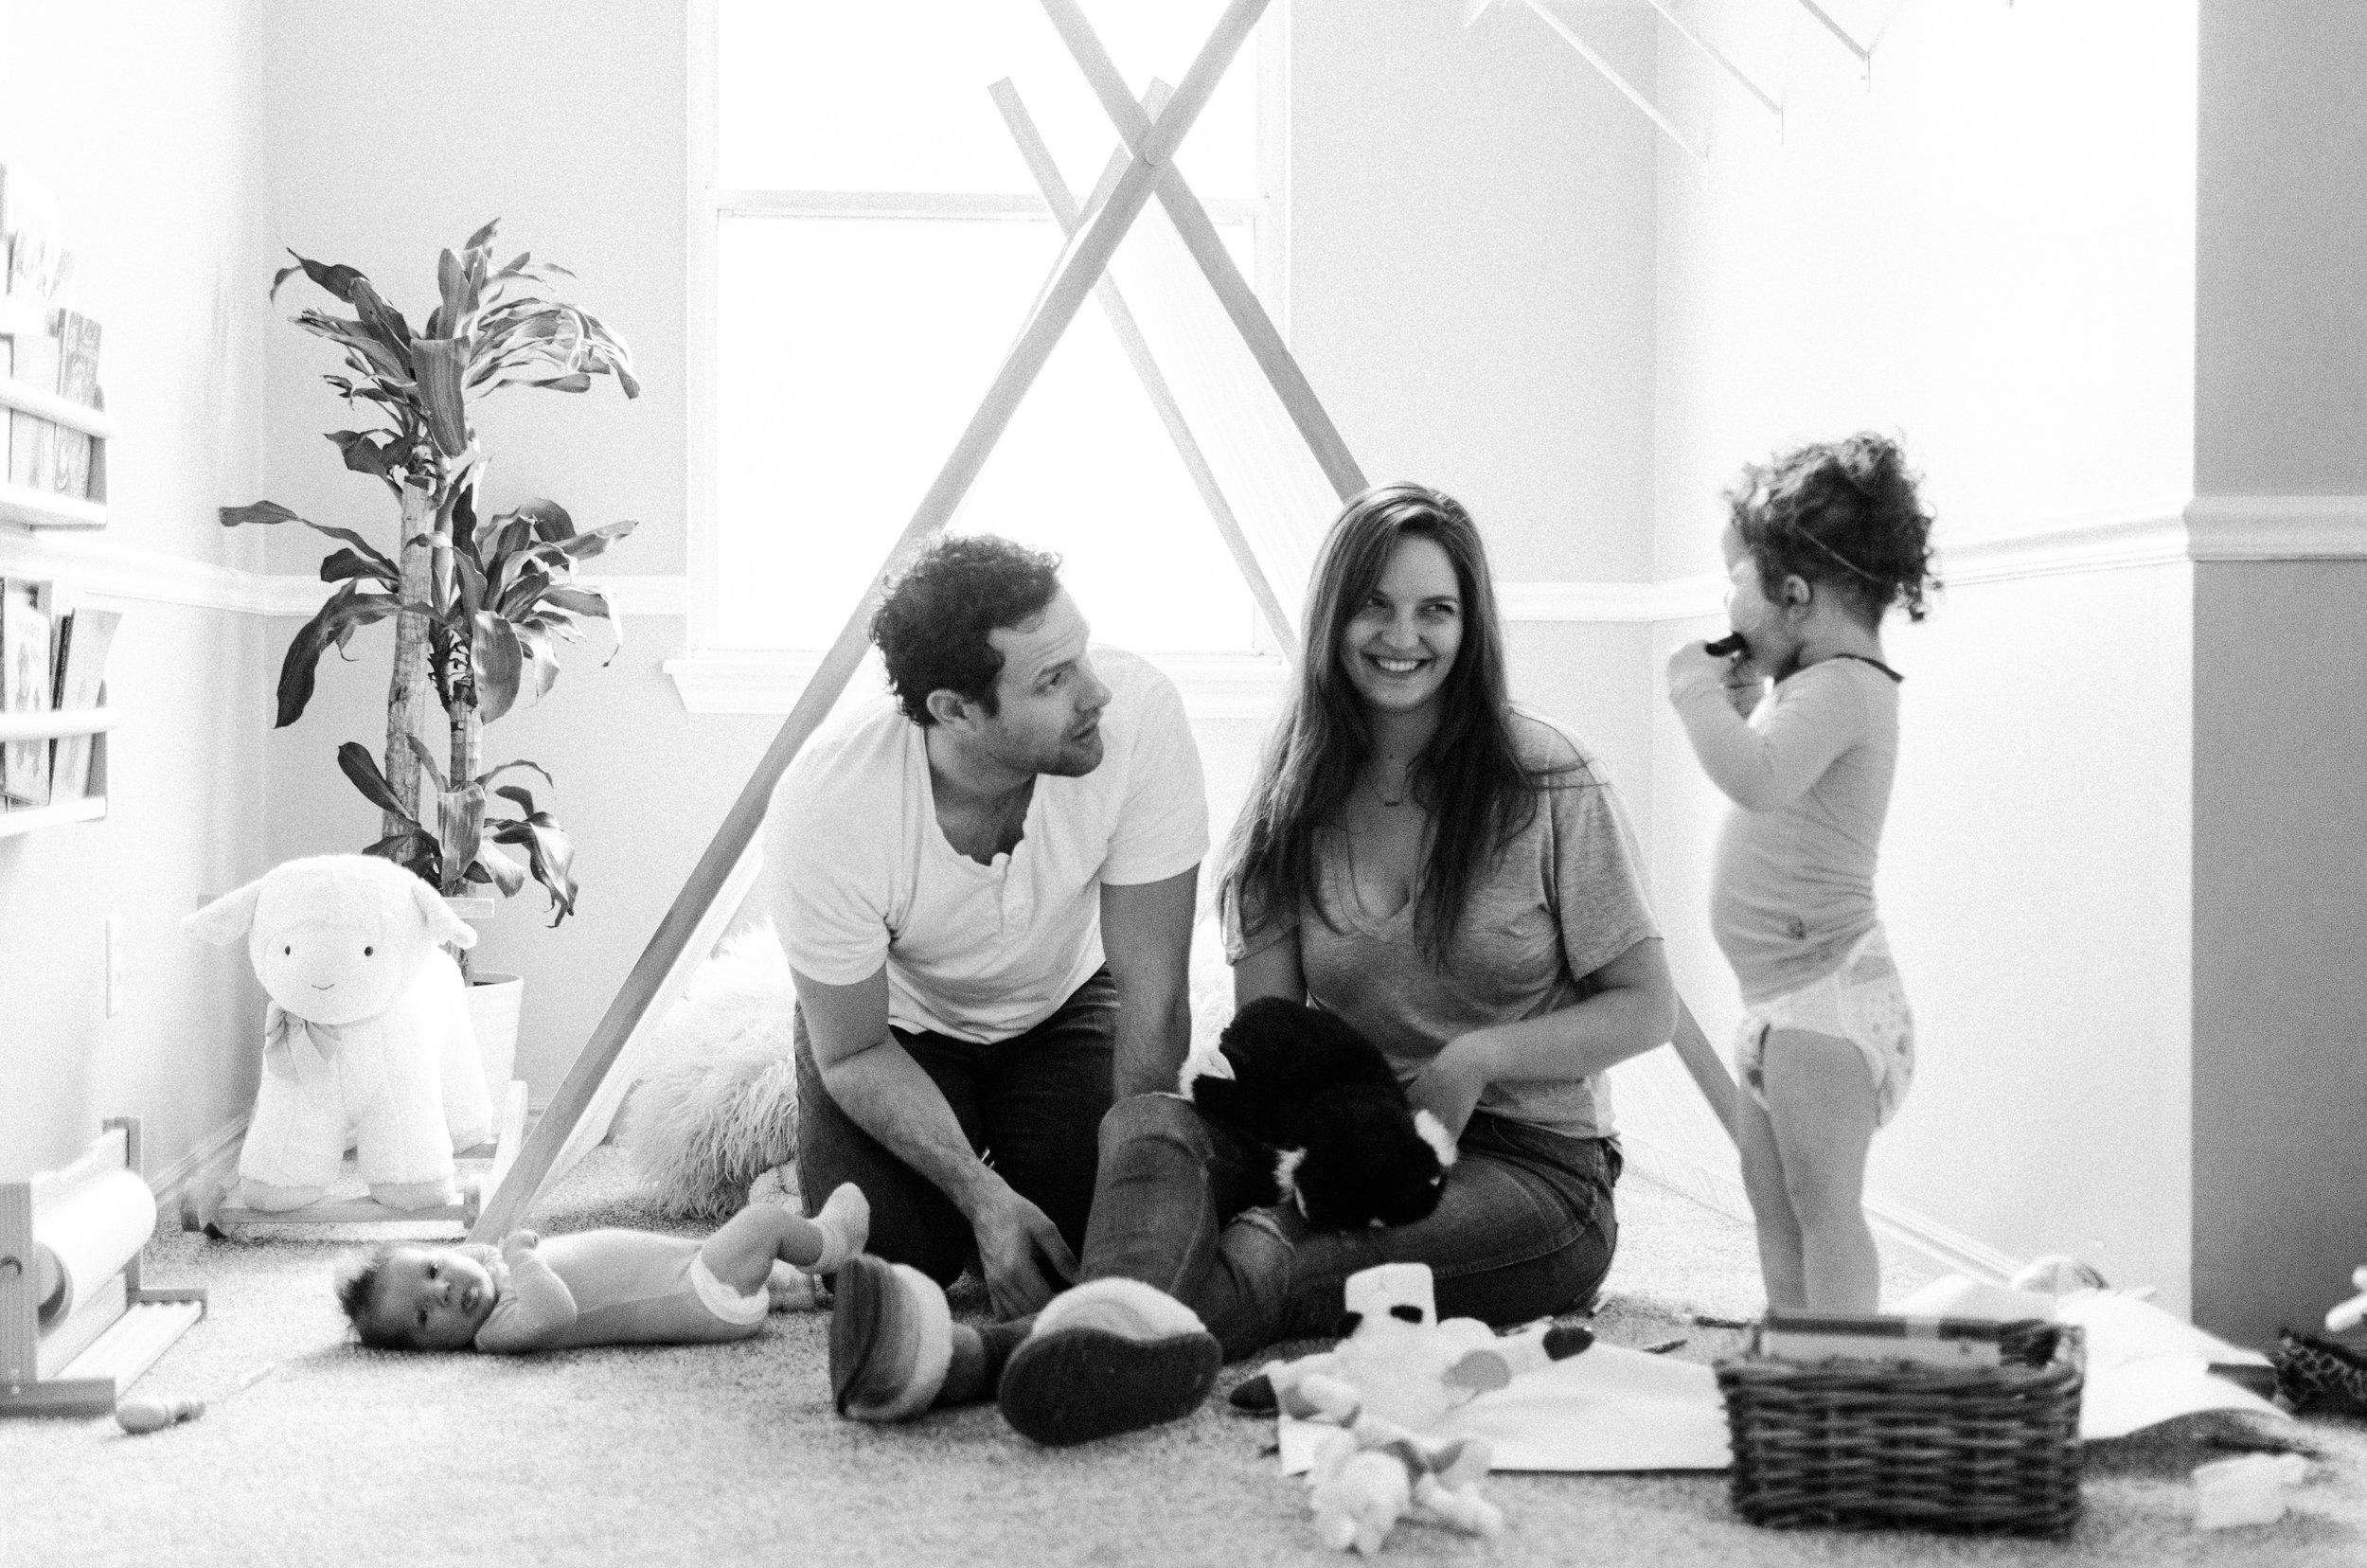 Utah Family Portrait Photographer, Provo, Utah